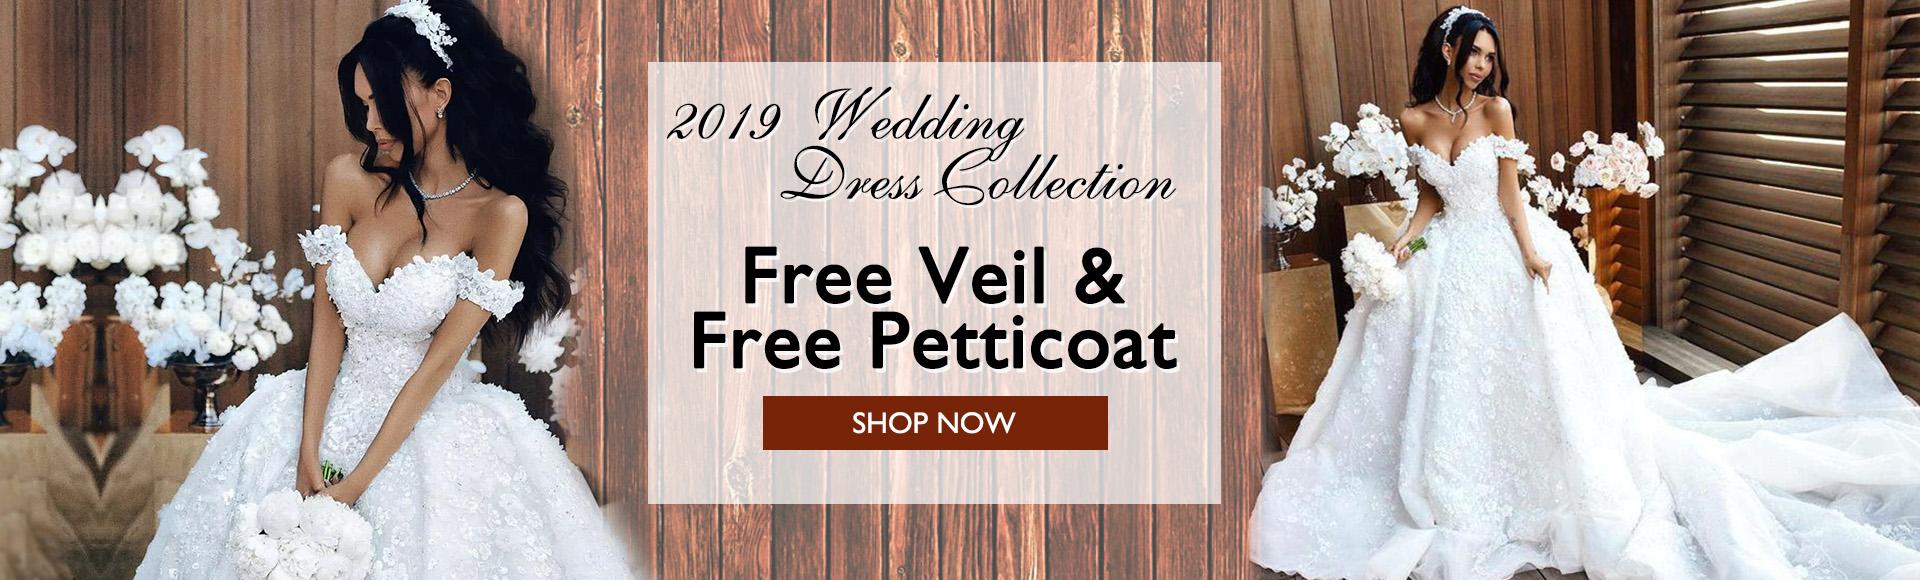 wedding dress-PC